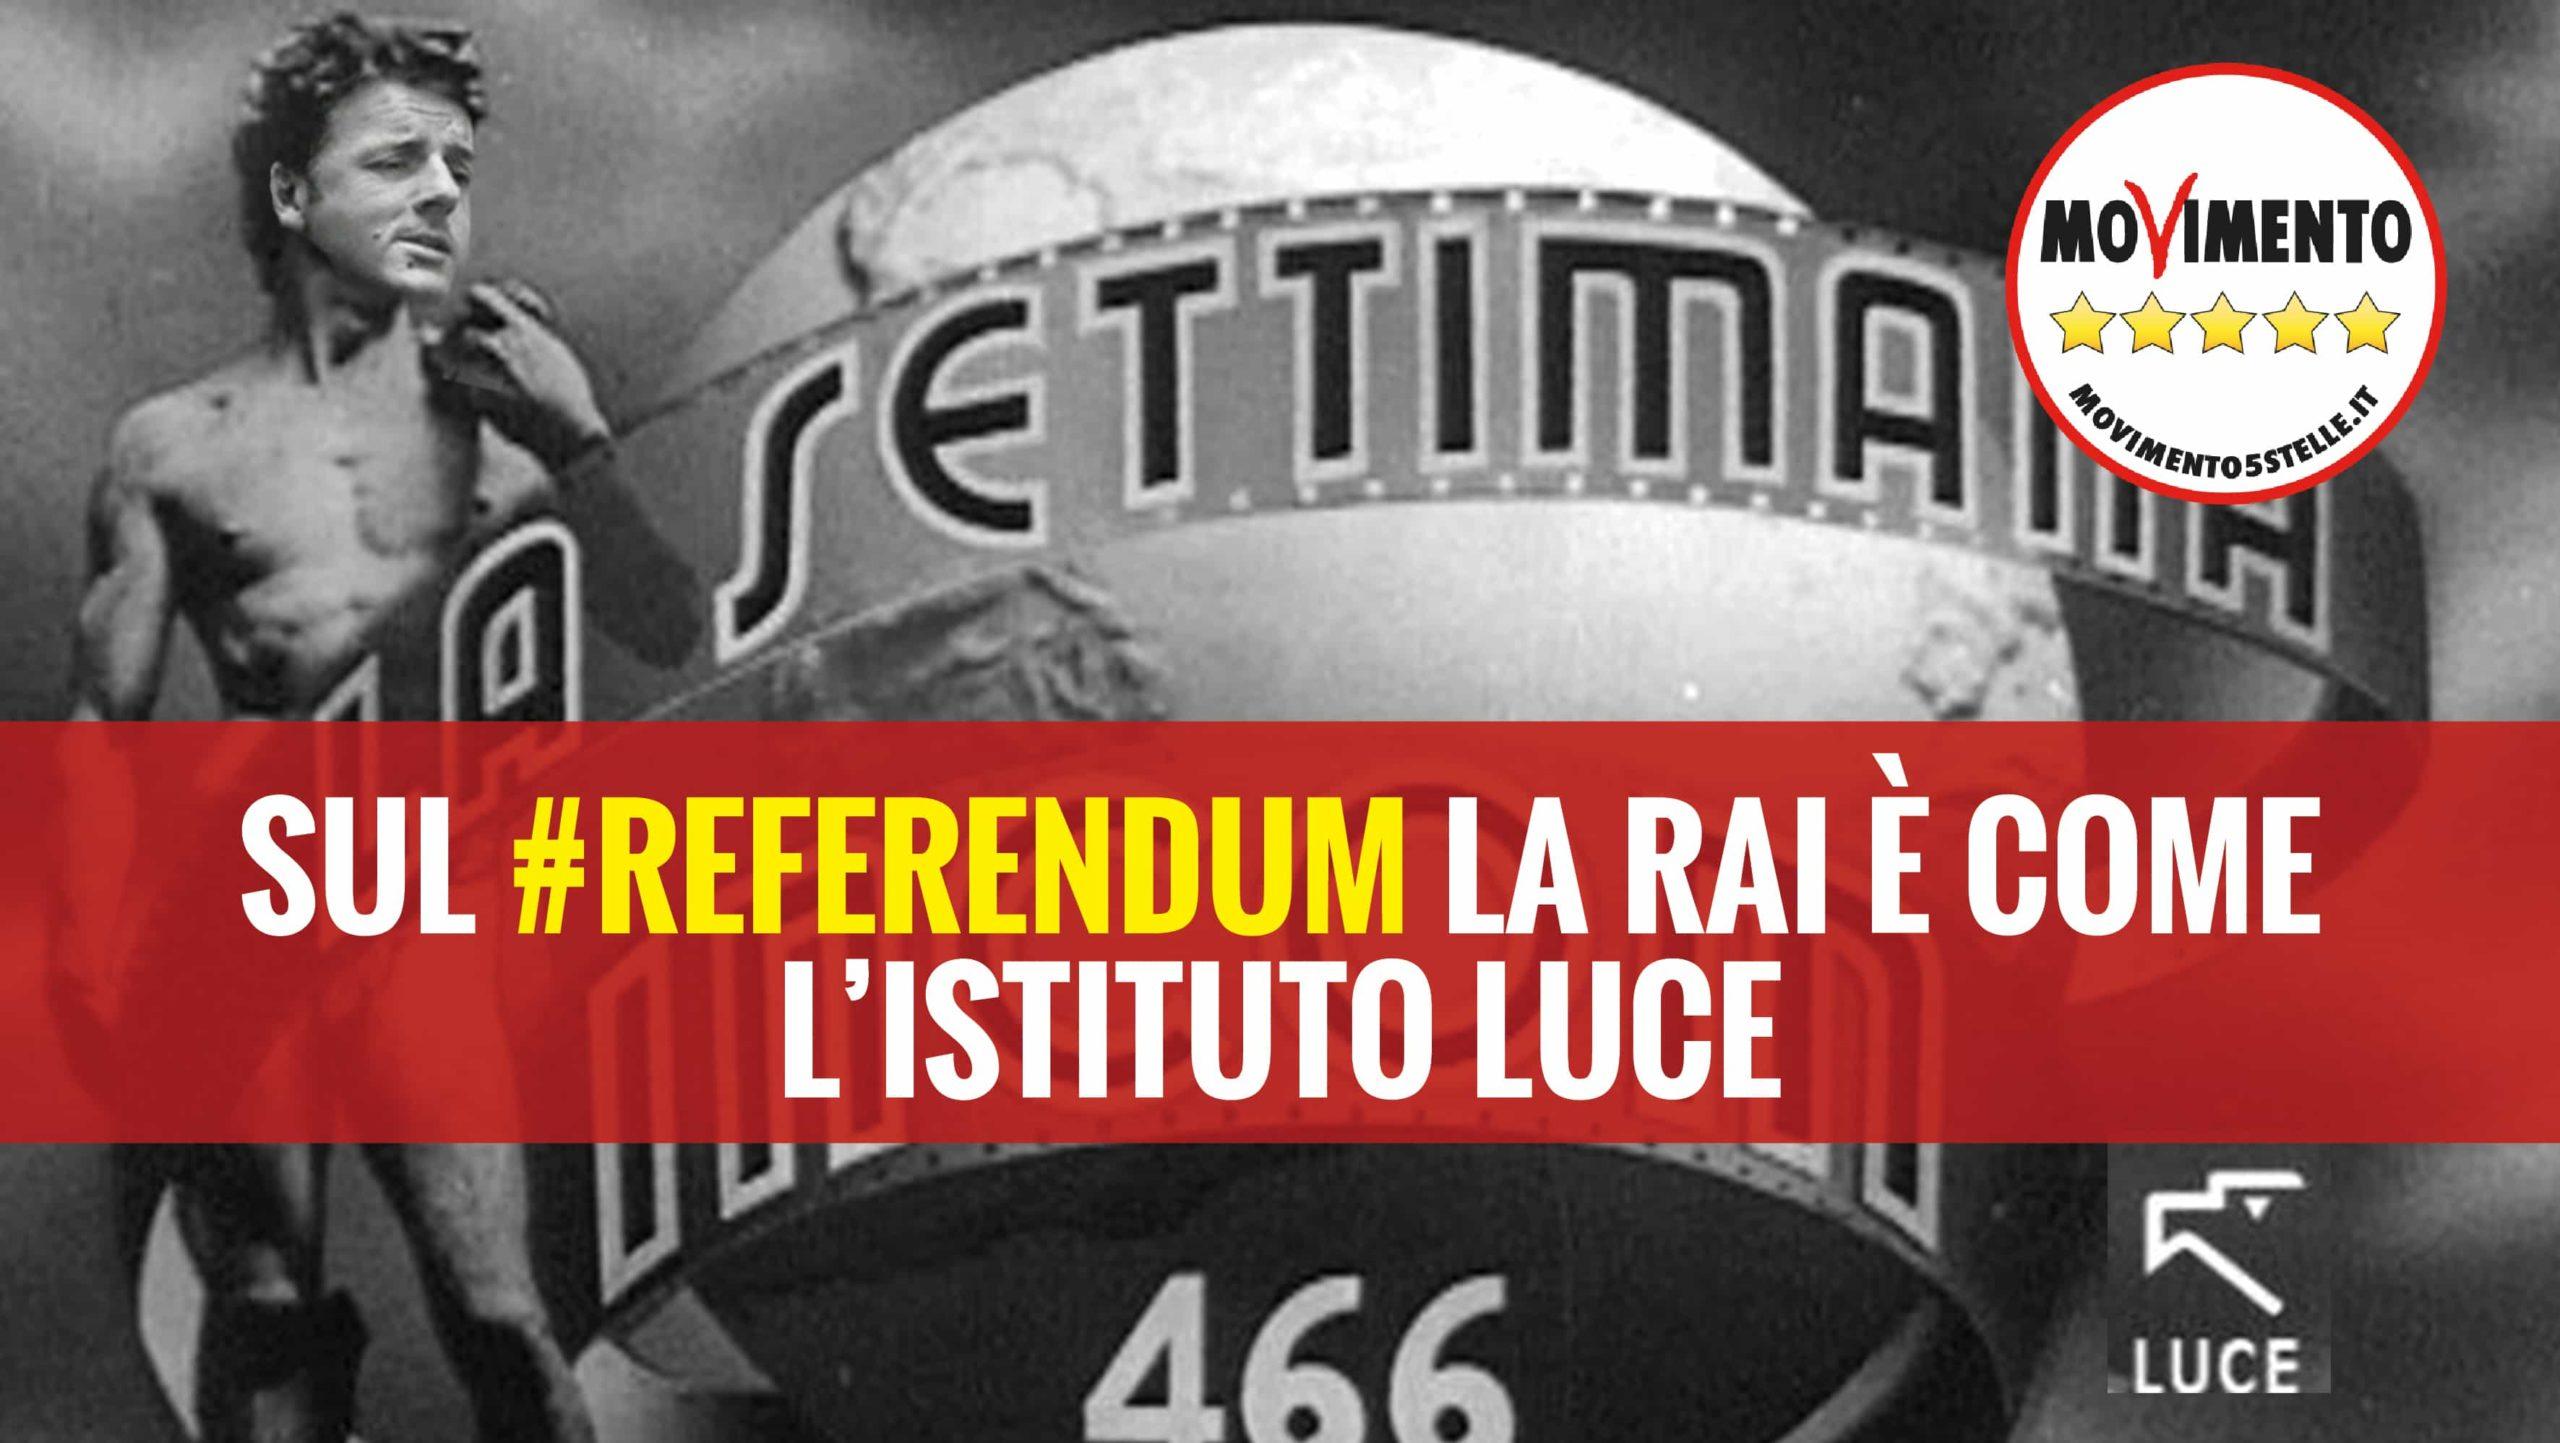 Marco Zullo M5S Europa renzi rai nomine anac referendum